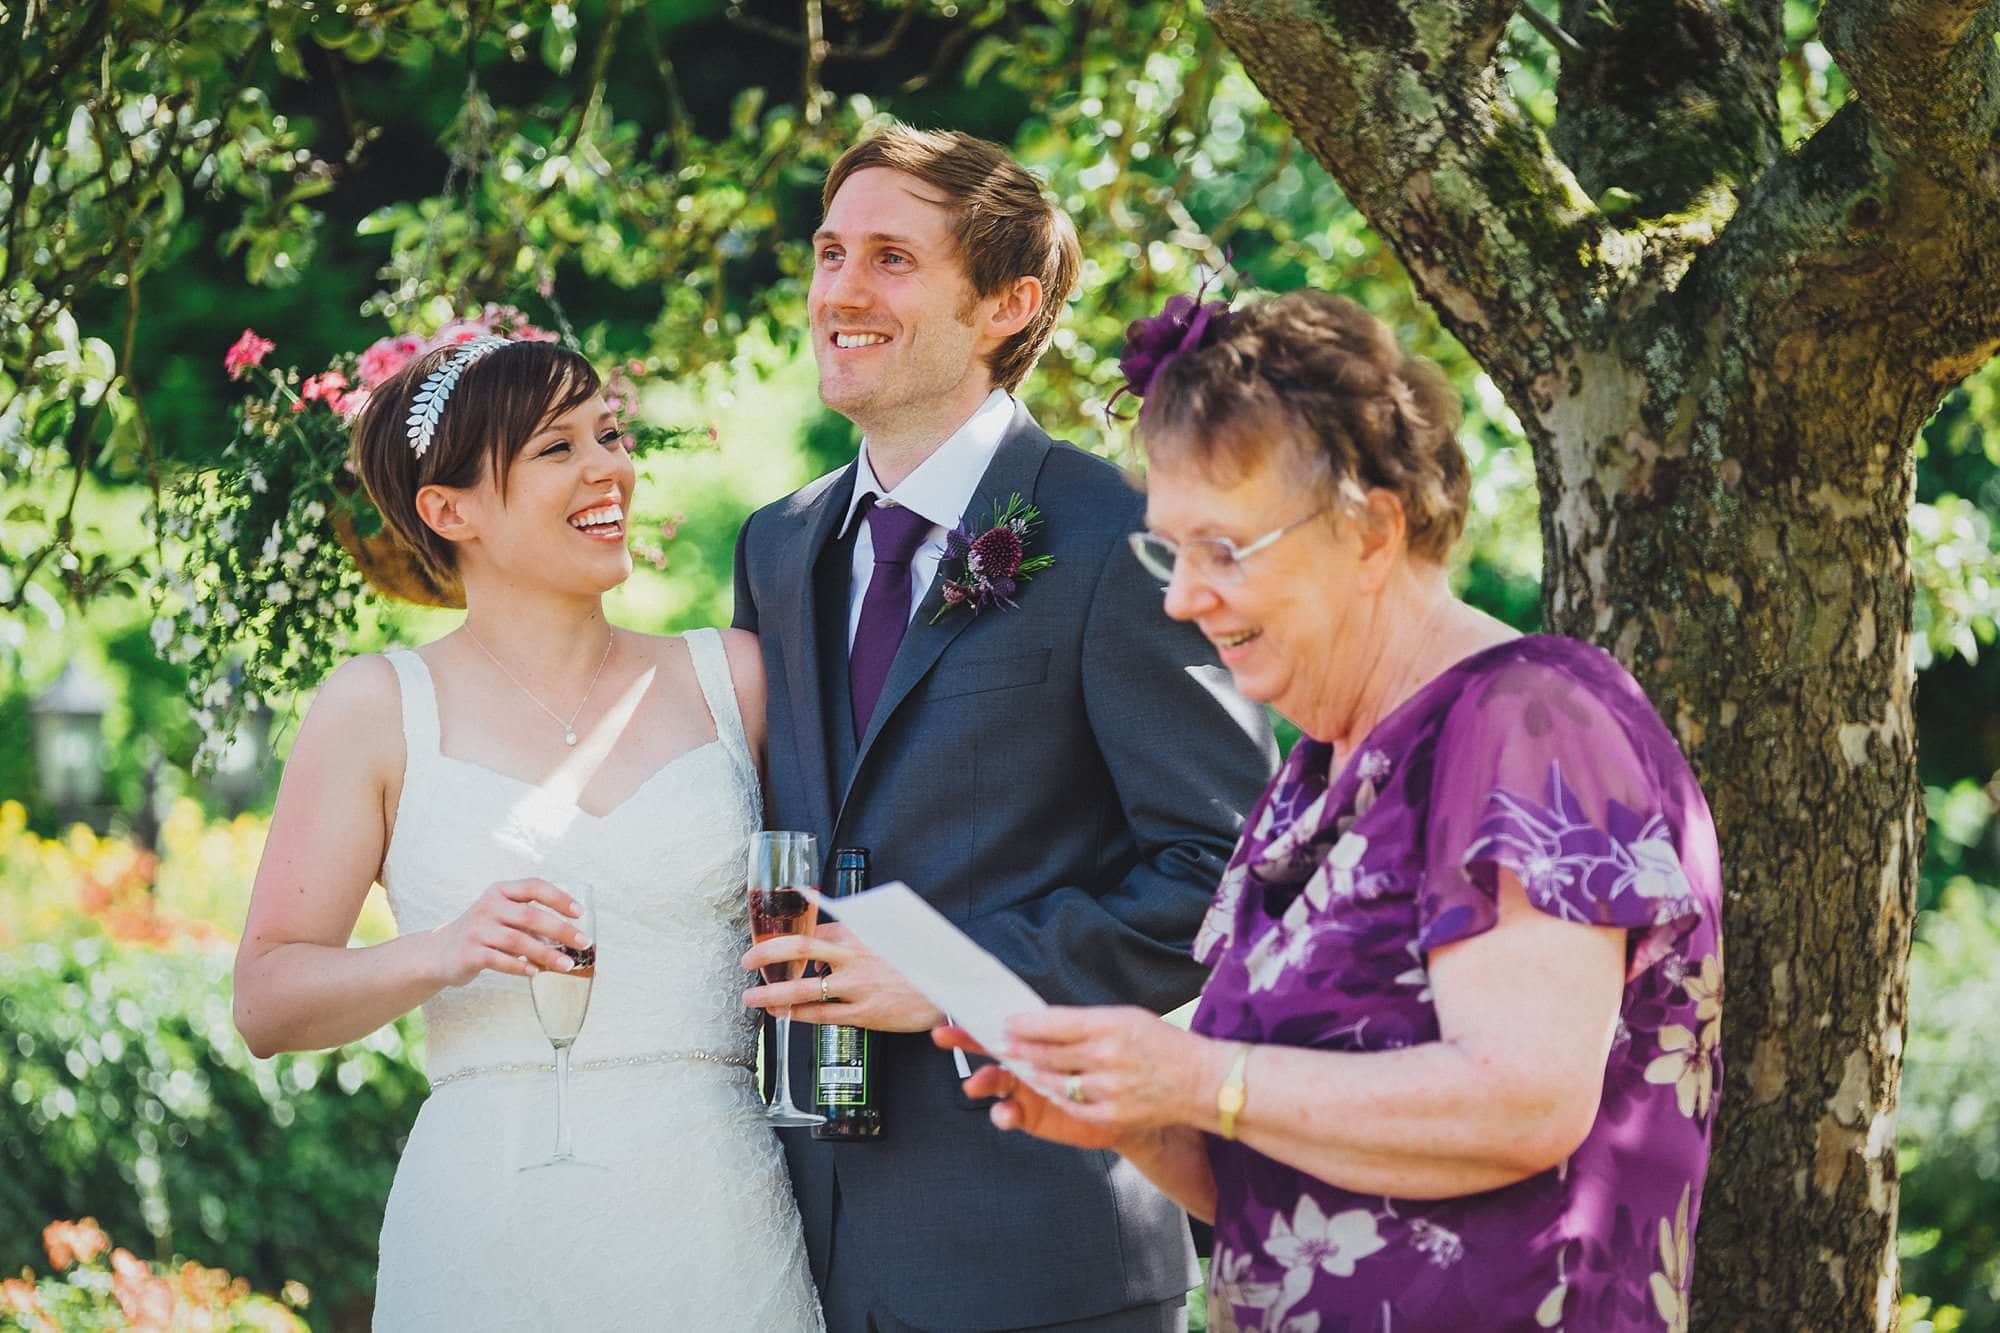 oaks farm wedding photographer cj 071 - Cat + Jake   Oaks Farm Wedding Photography